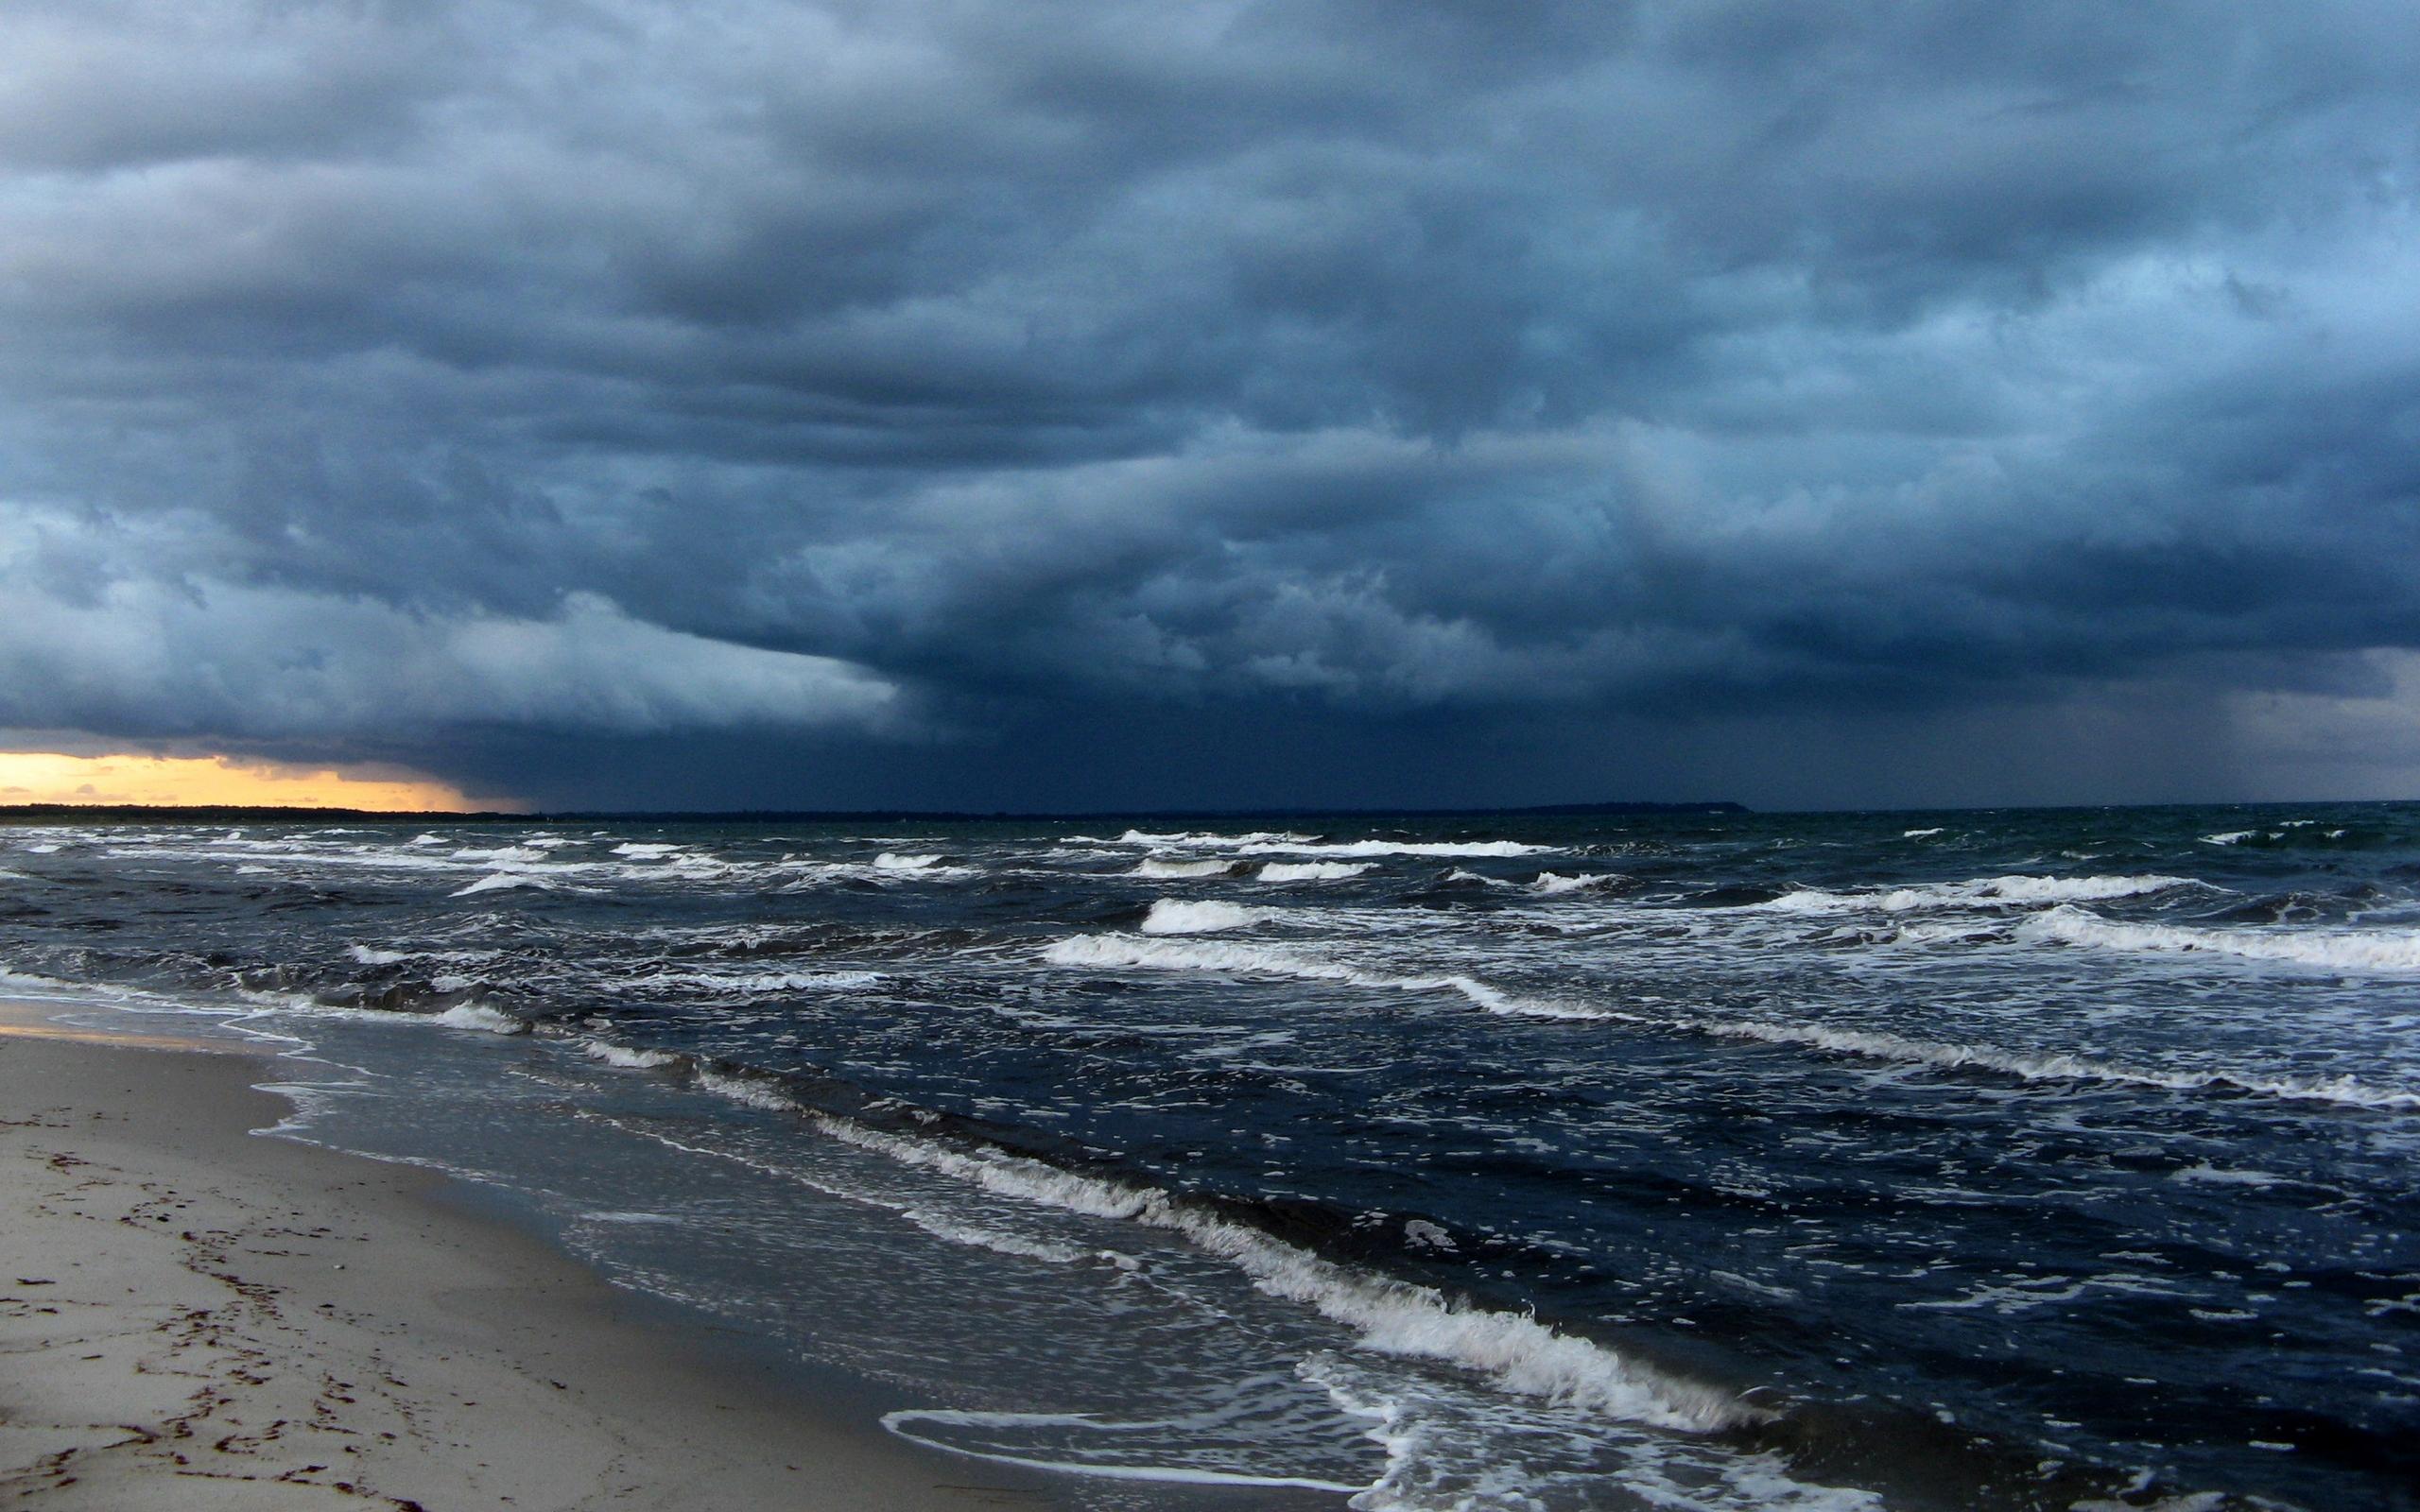 Storm Hd Wallpaper Background Image 2560x1600 Id